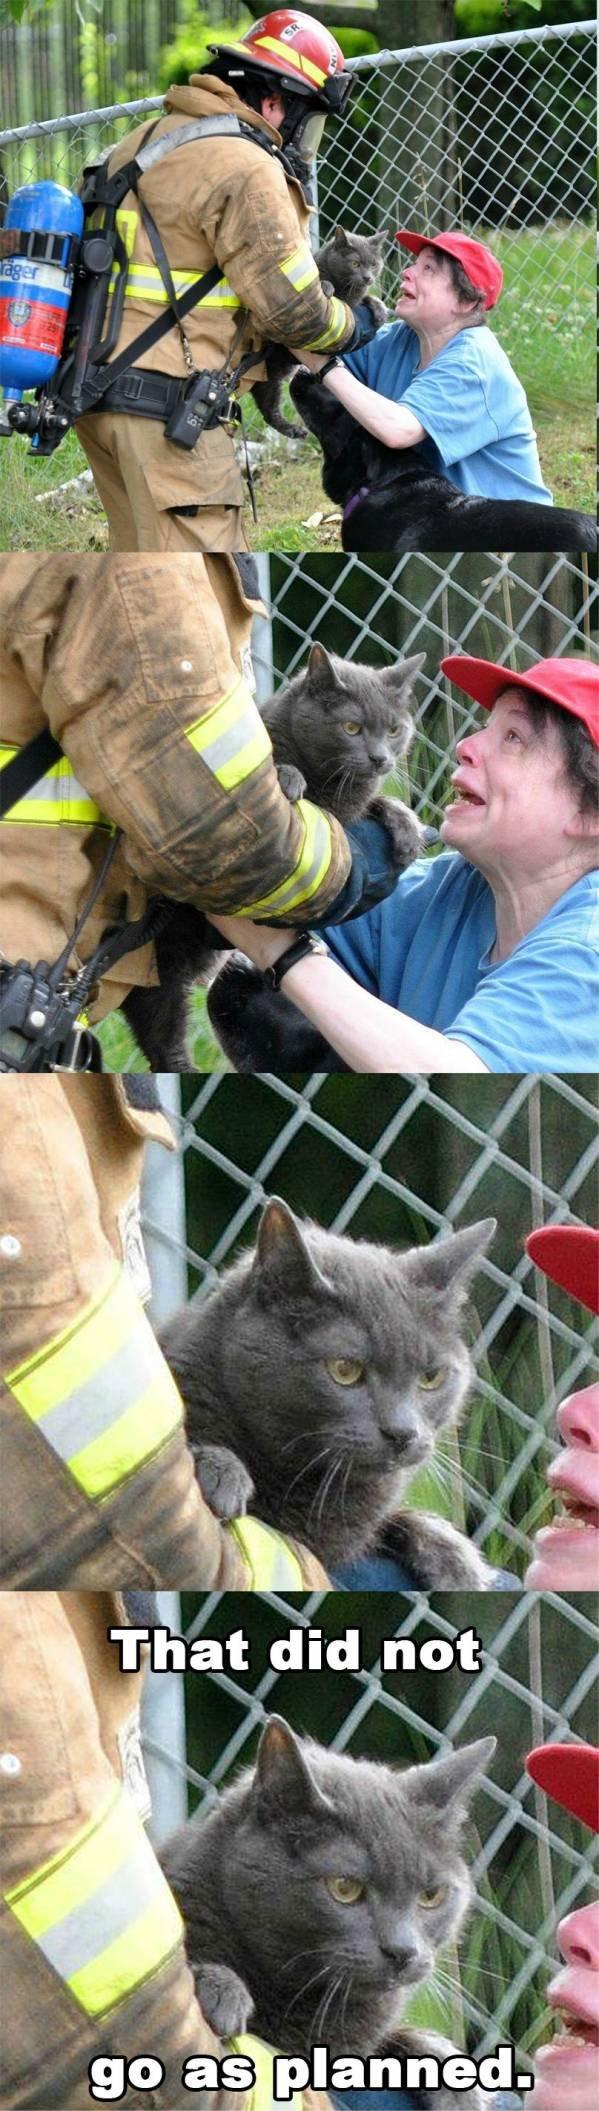 pyro kitty.jpg